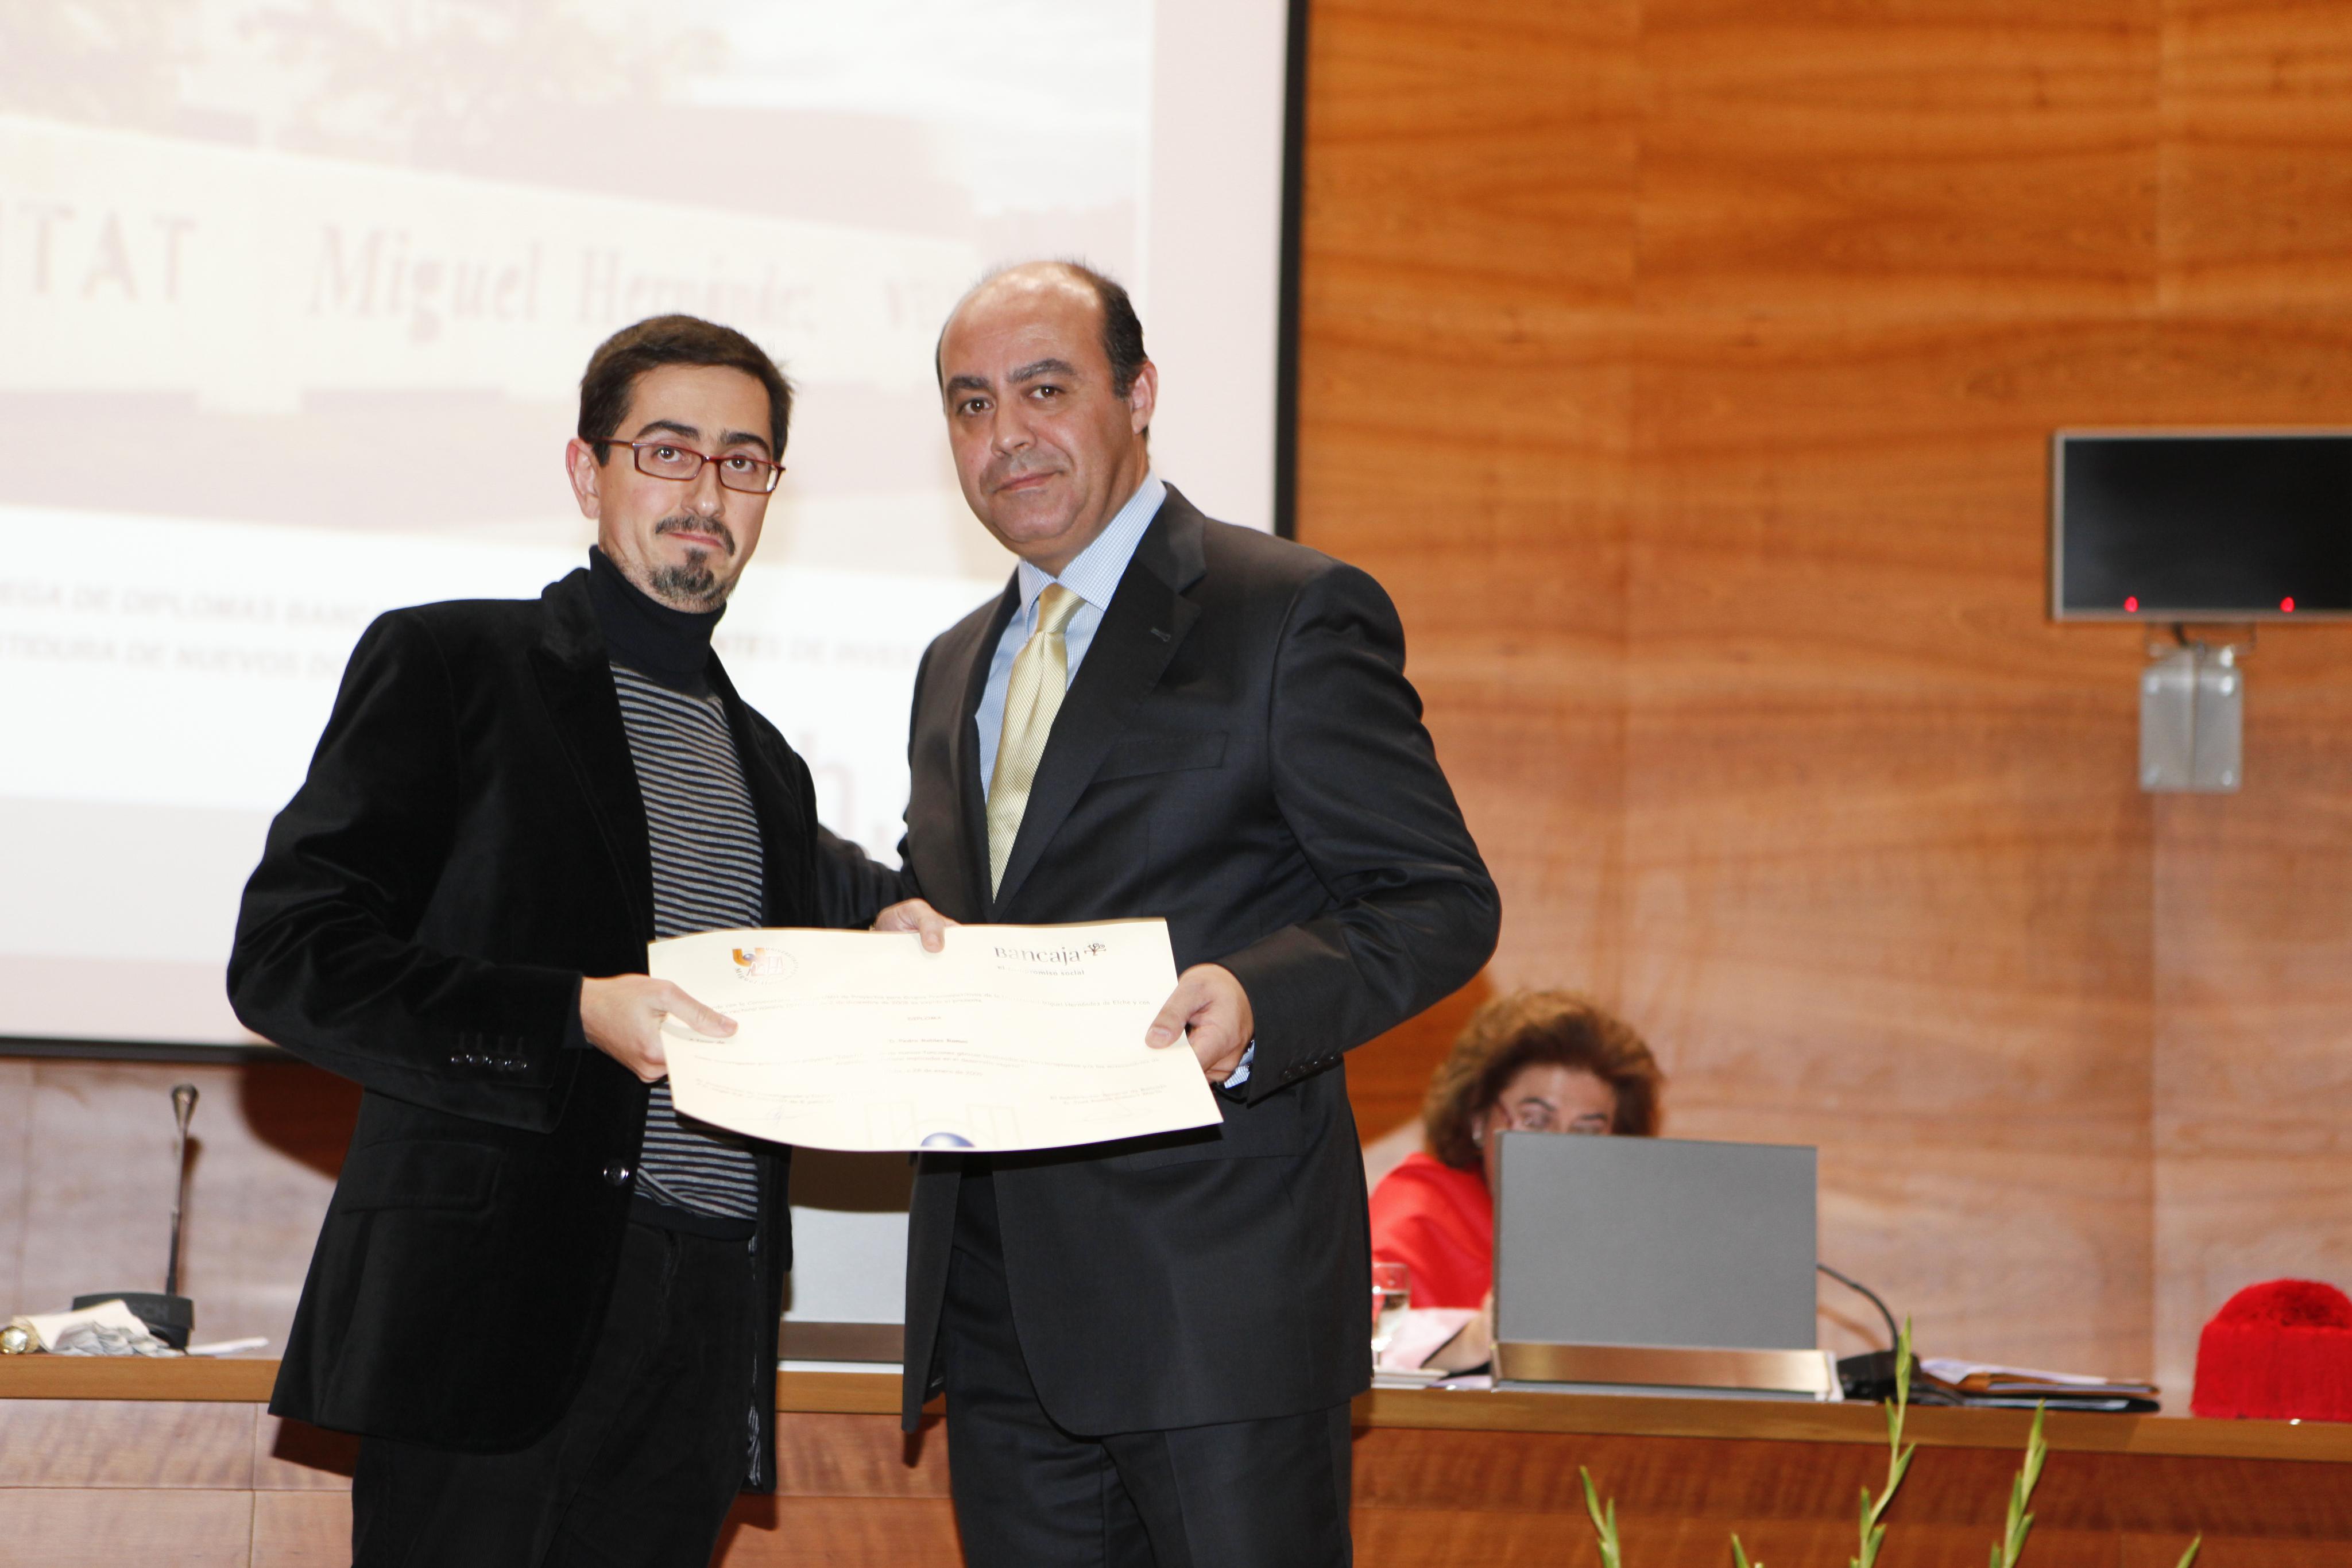 Entrega Diplomas_mg_5256.jpg